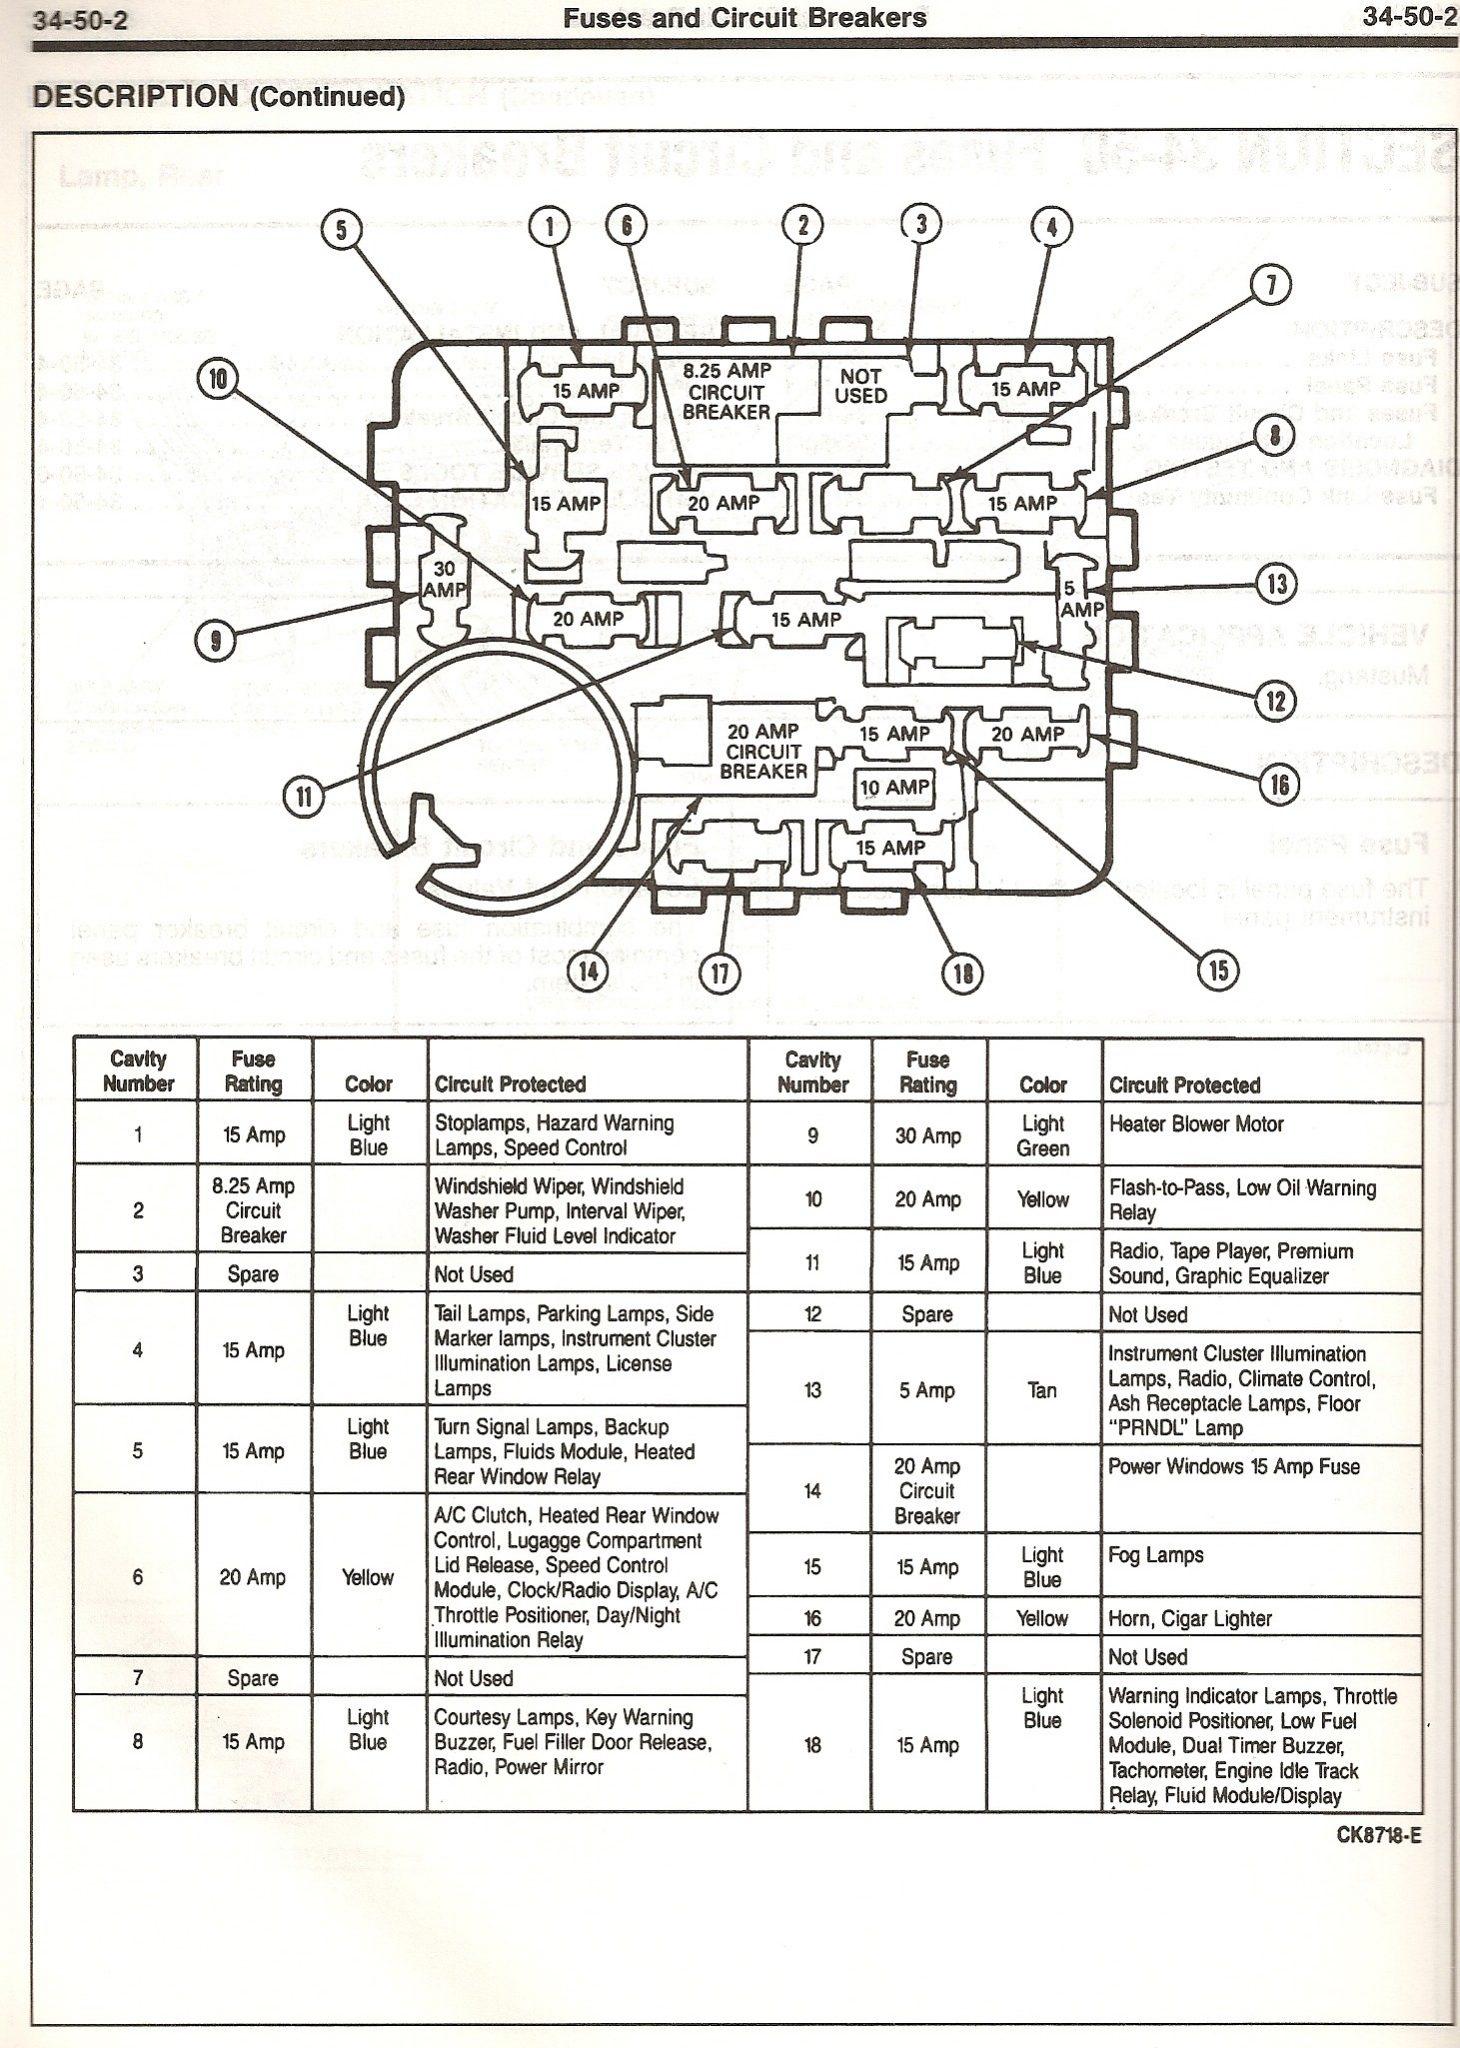 1990 ford e 450 fuse diagram 93 f 150 fuse box wiring library  93 f 150 fuse box wiring library